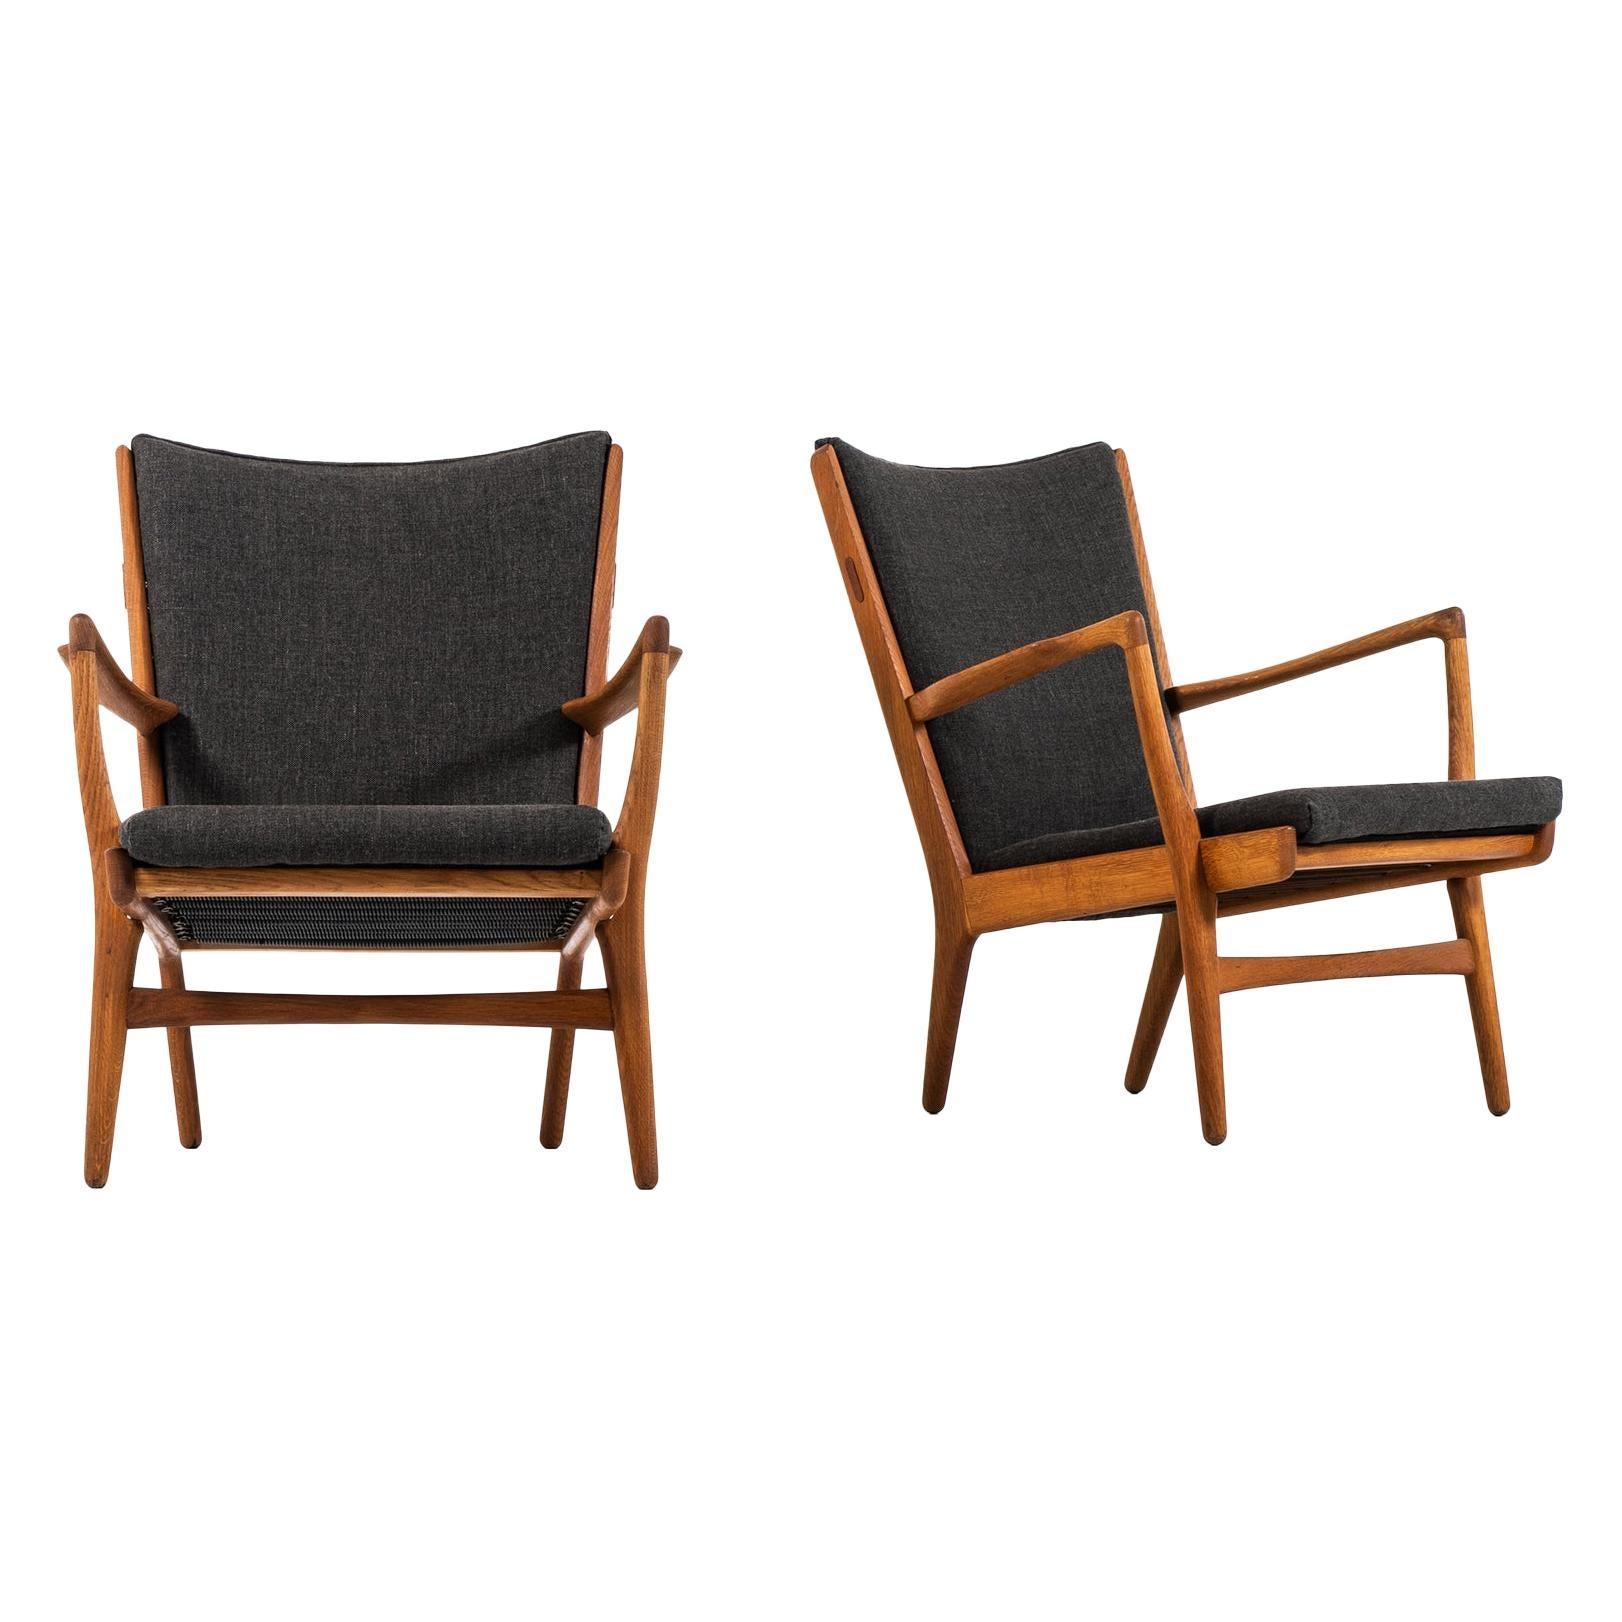 Hans Wegner AP-16 Easy Chairs Produced by AP-Stolen in Denmark